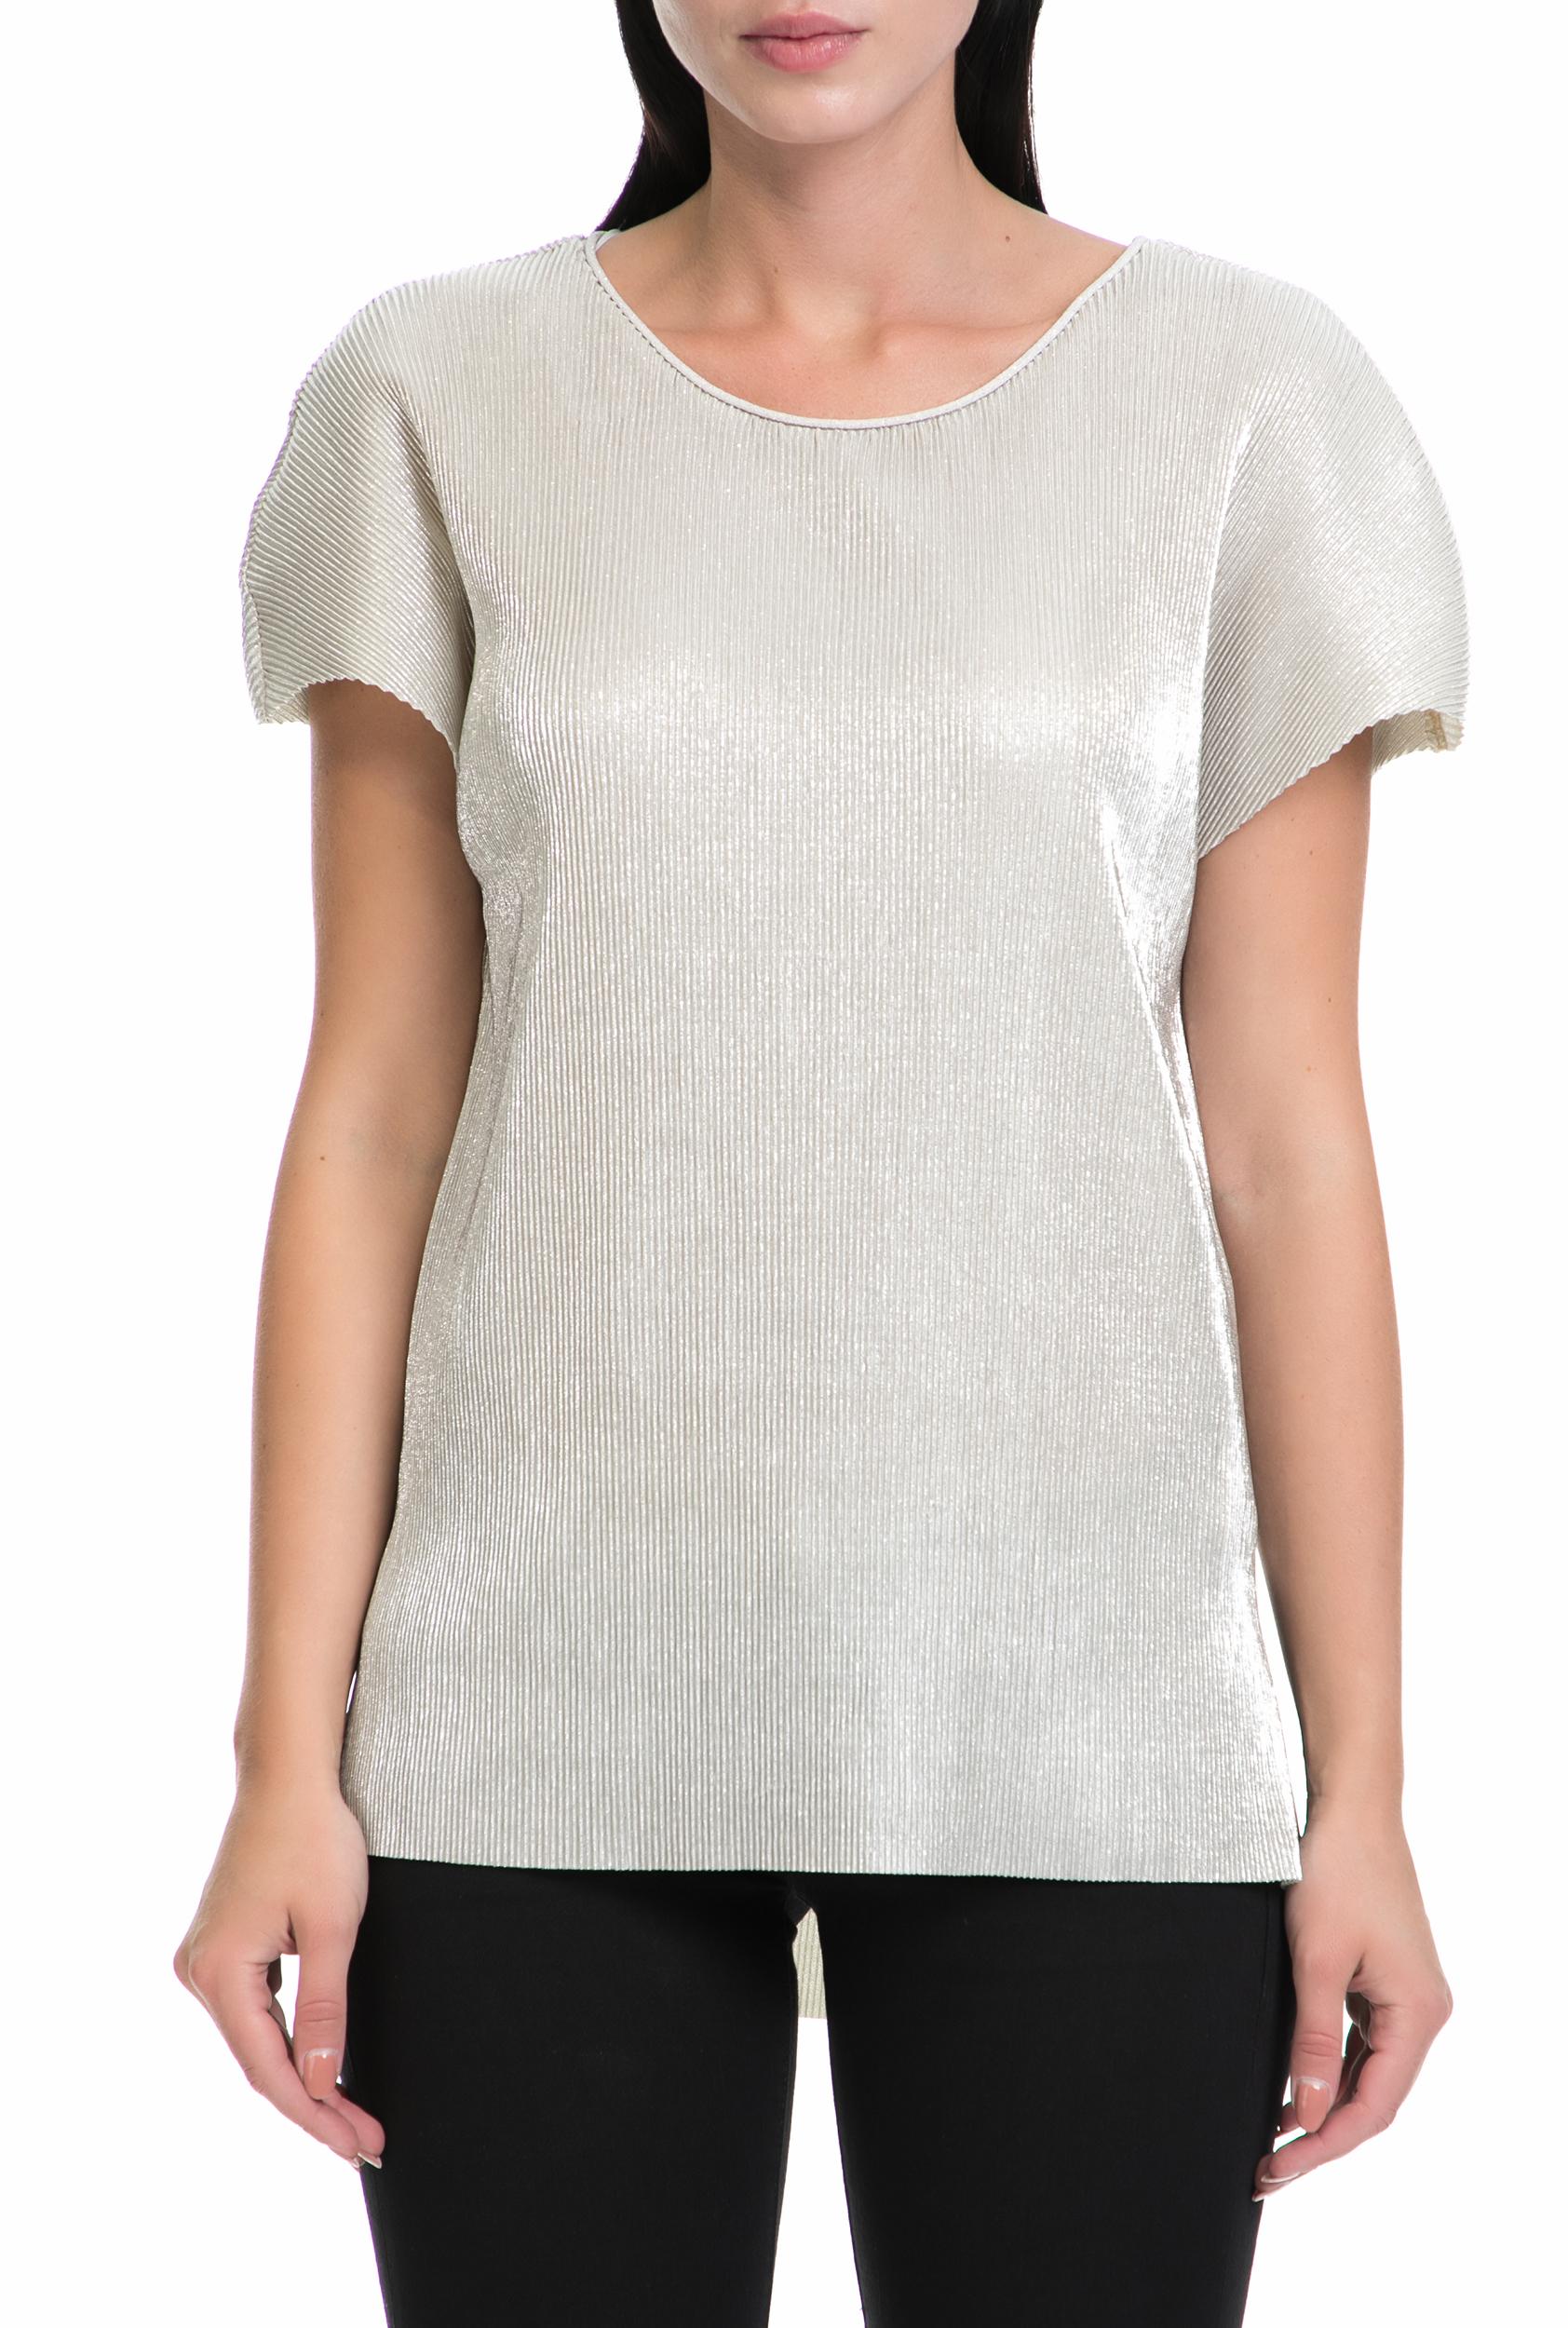 GAS - Γυναικεία μπλούζα LIBER GAS ασημί